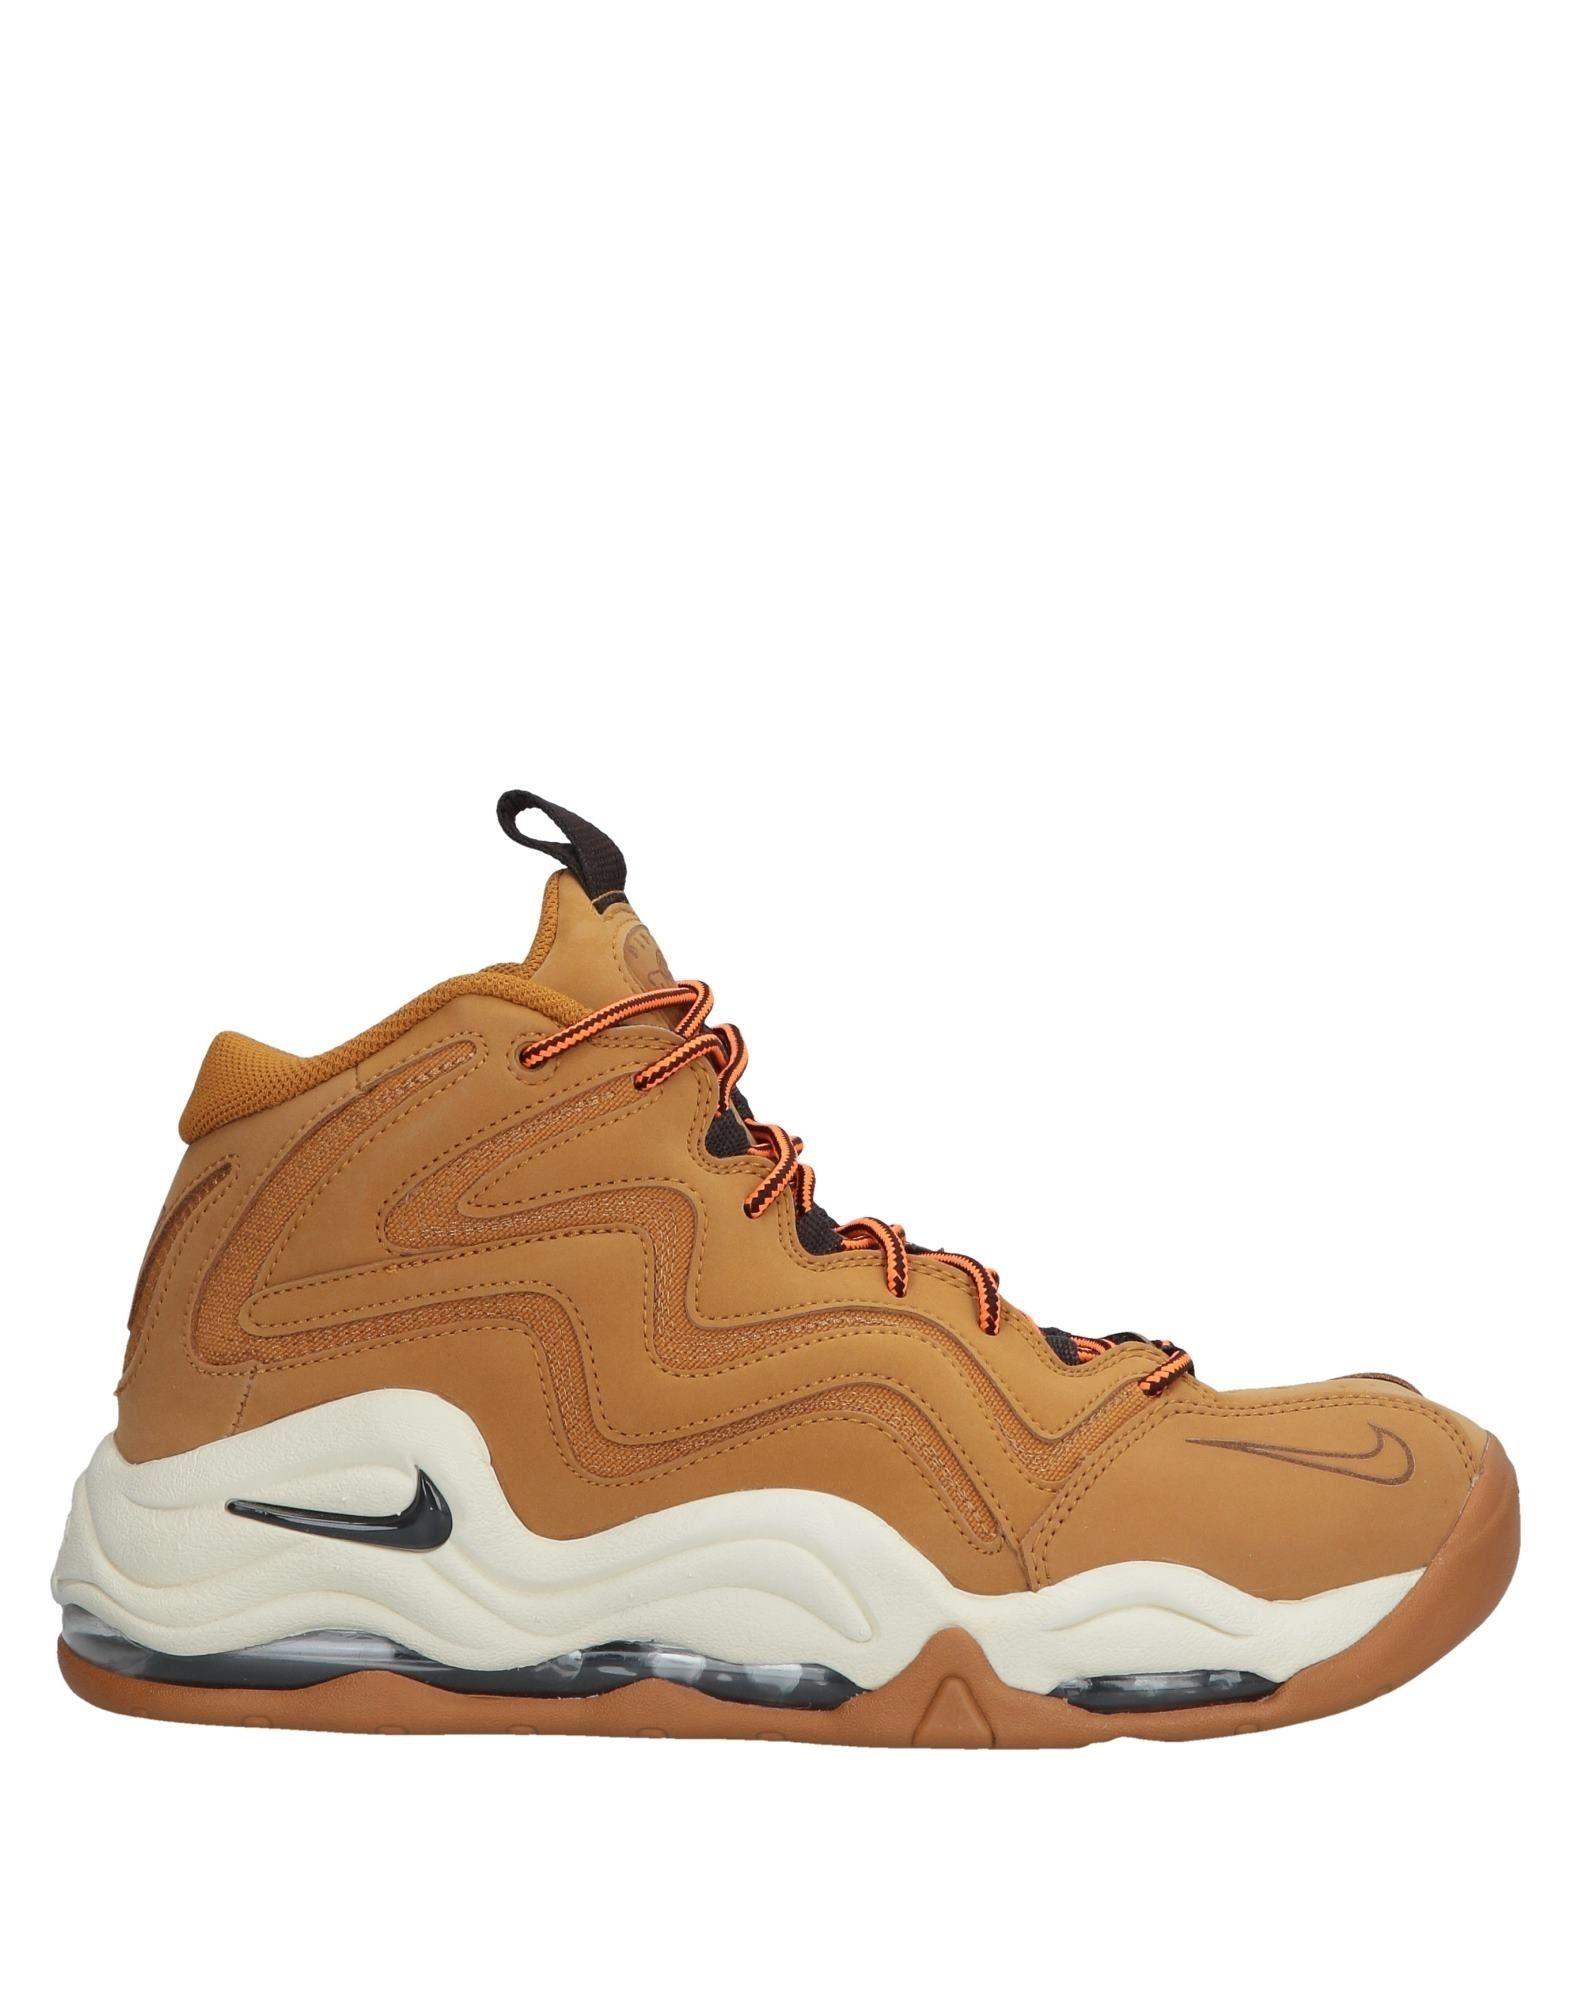 Scarpe da Ginnastica Nike Uomo Scarpe 11564085KM  e3e24e   11564085KM 94683d